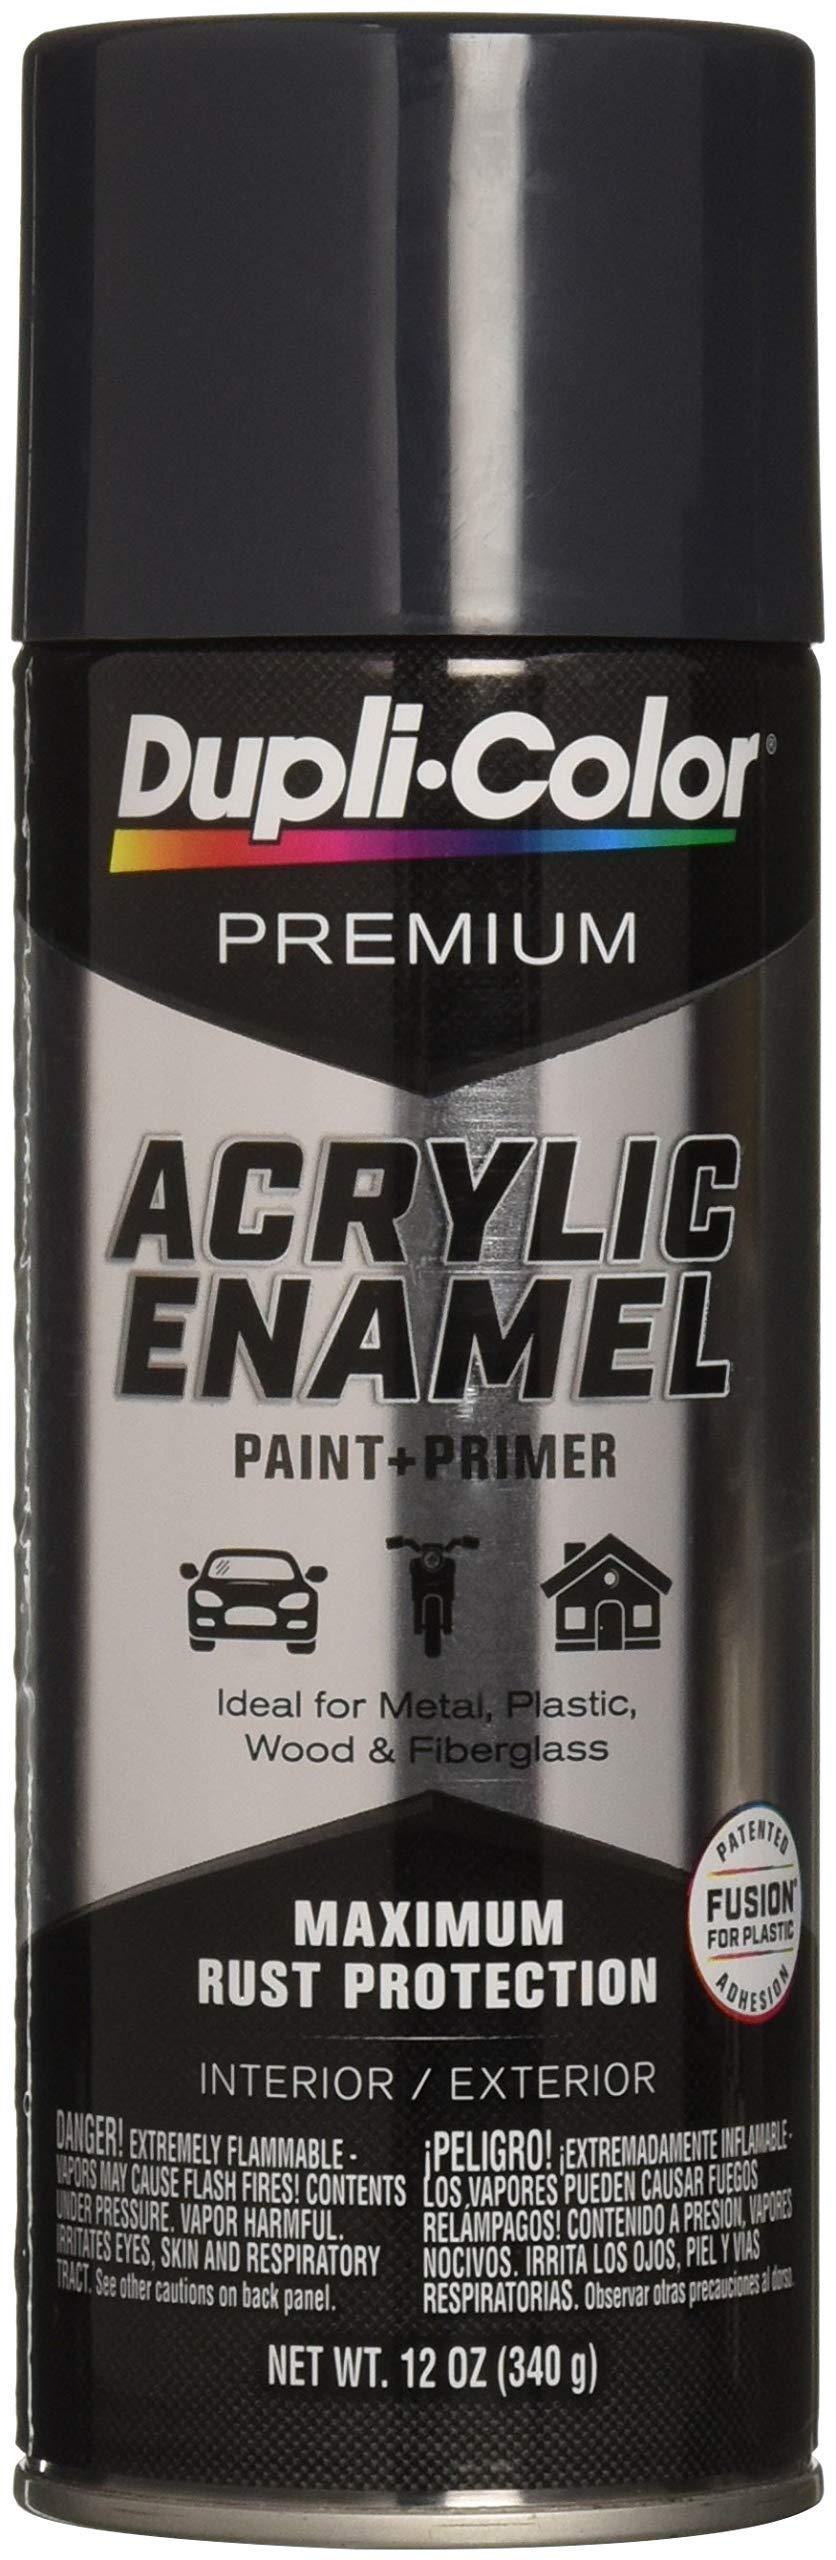 Dupli-Color EPAE10800 Premium Acrylic Enamel Spray Paint (PAE108 Gunmetal 12 oz), 12. Fluid_Ounces